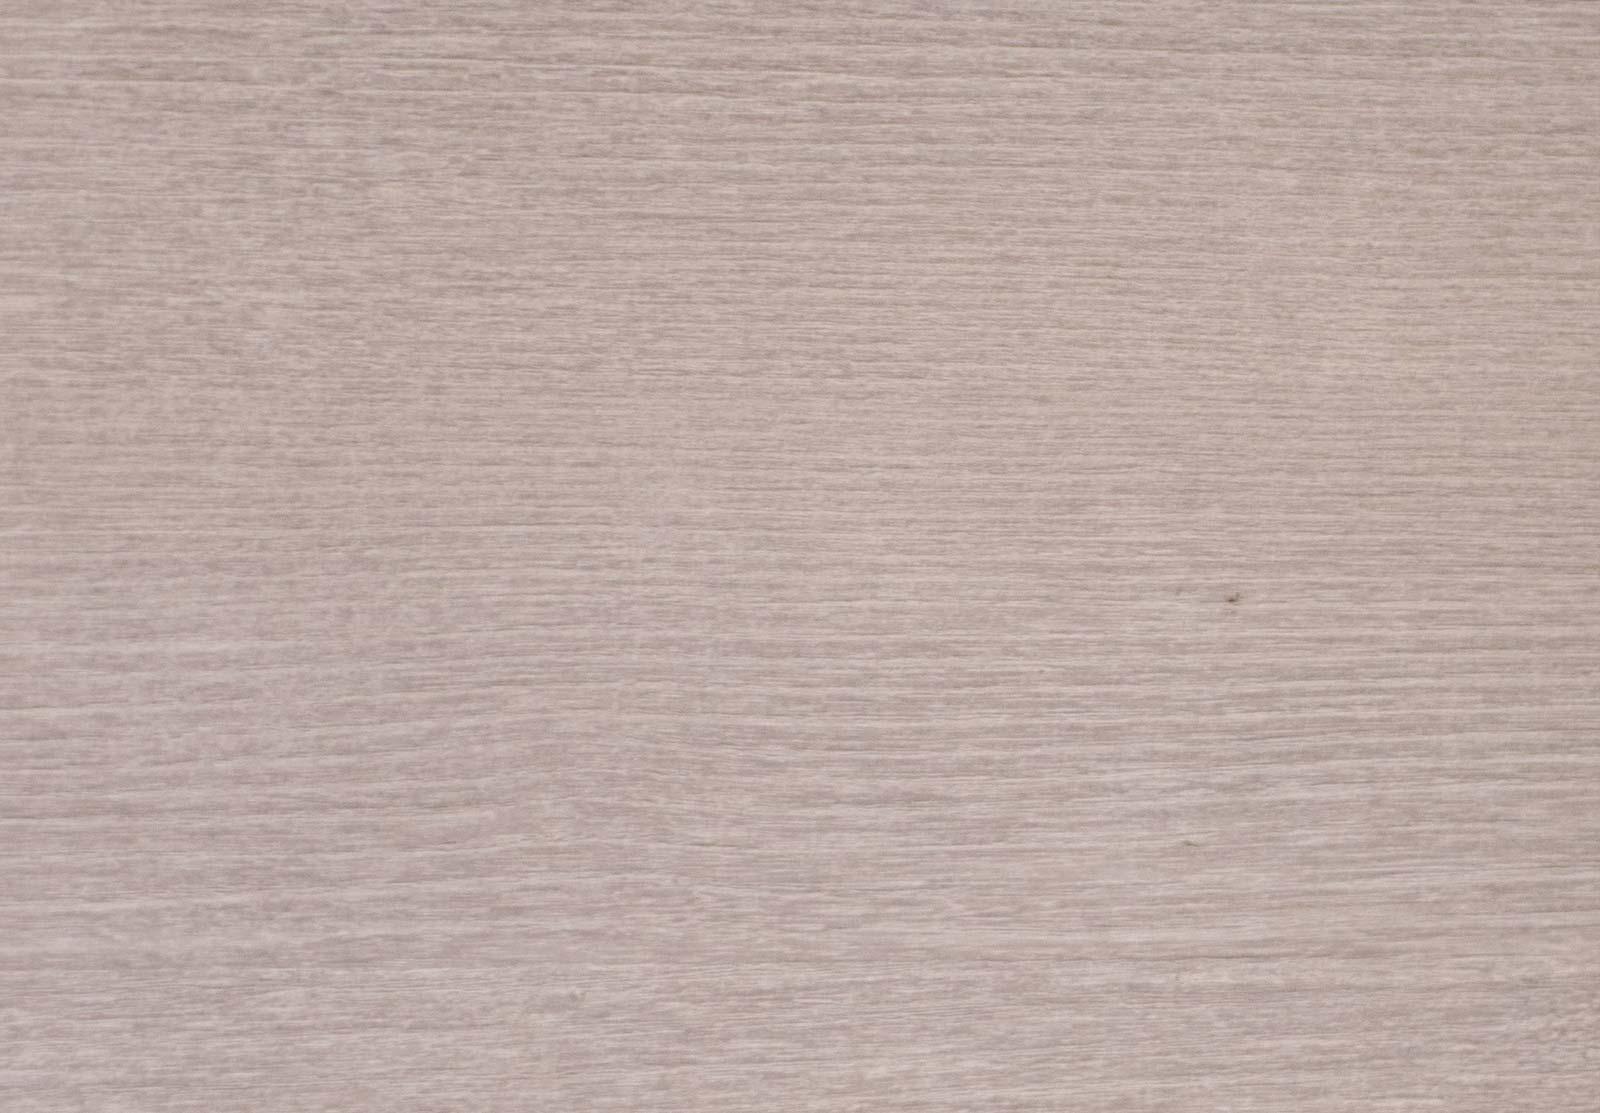 Pannelli alfawood - Ambra Grigio 9324